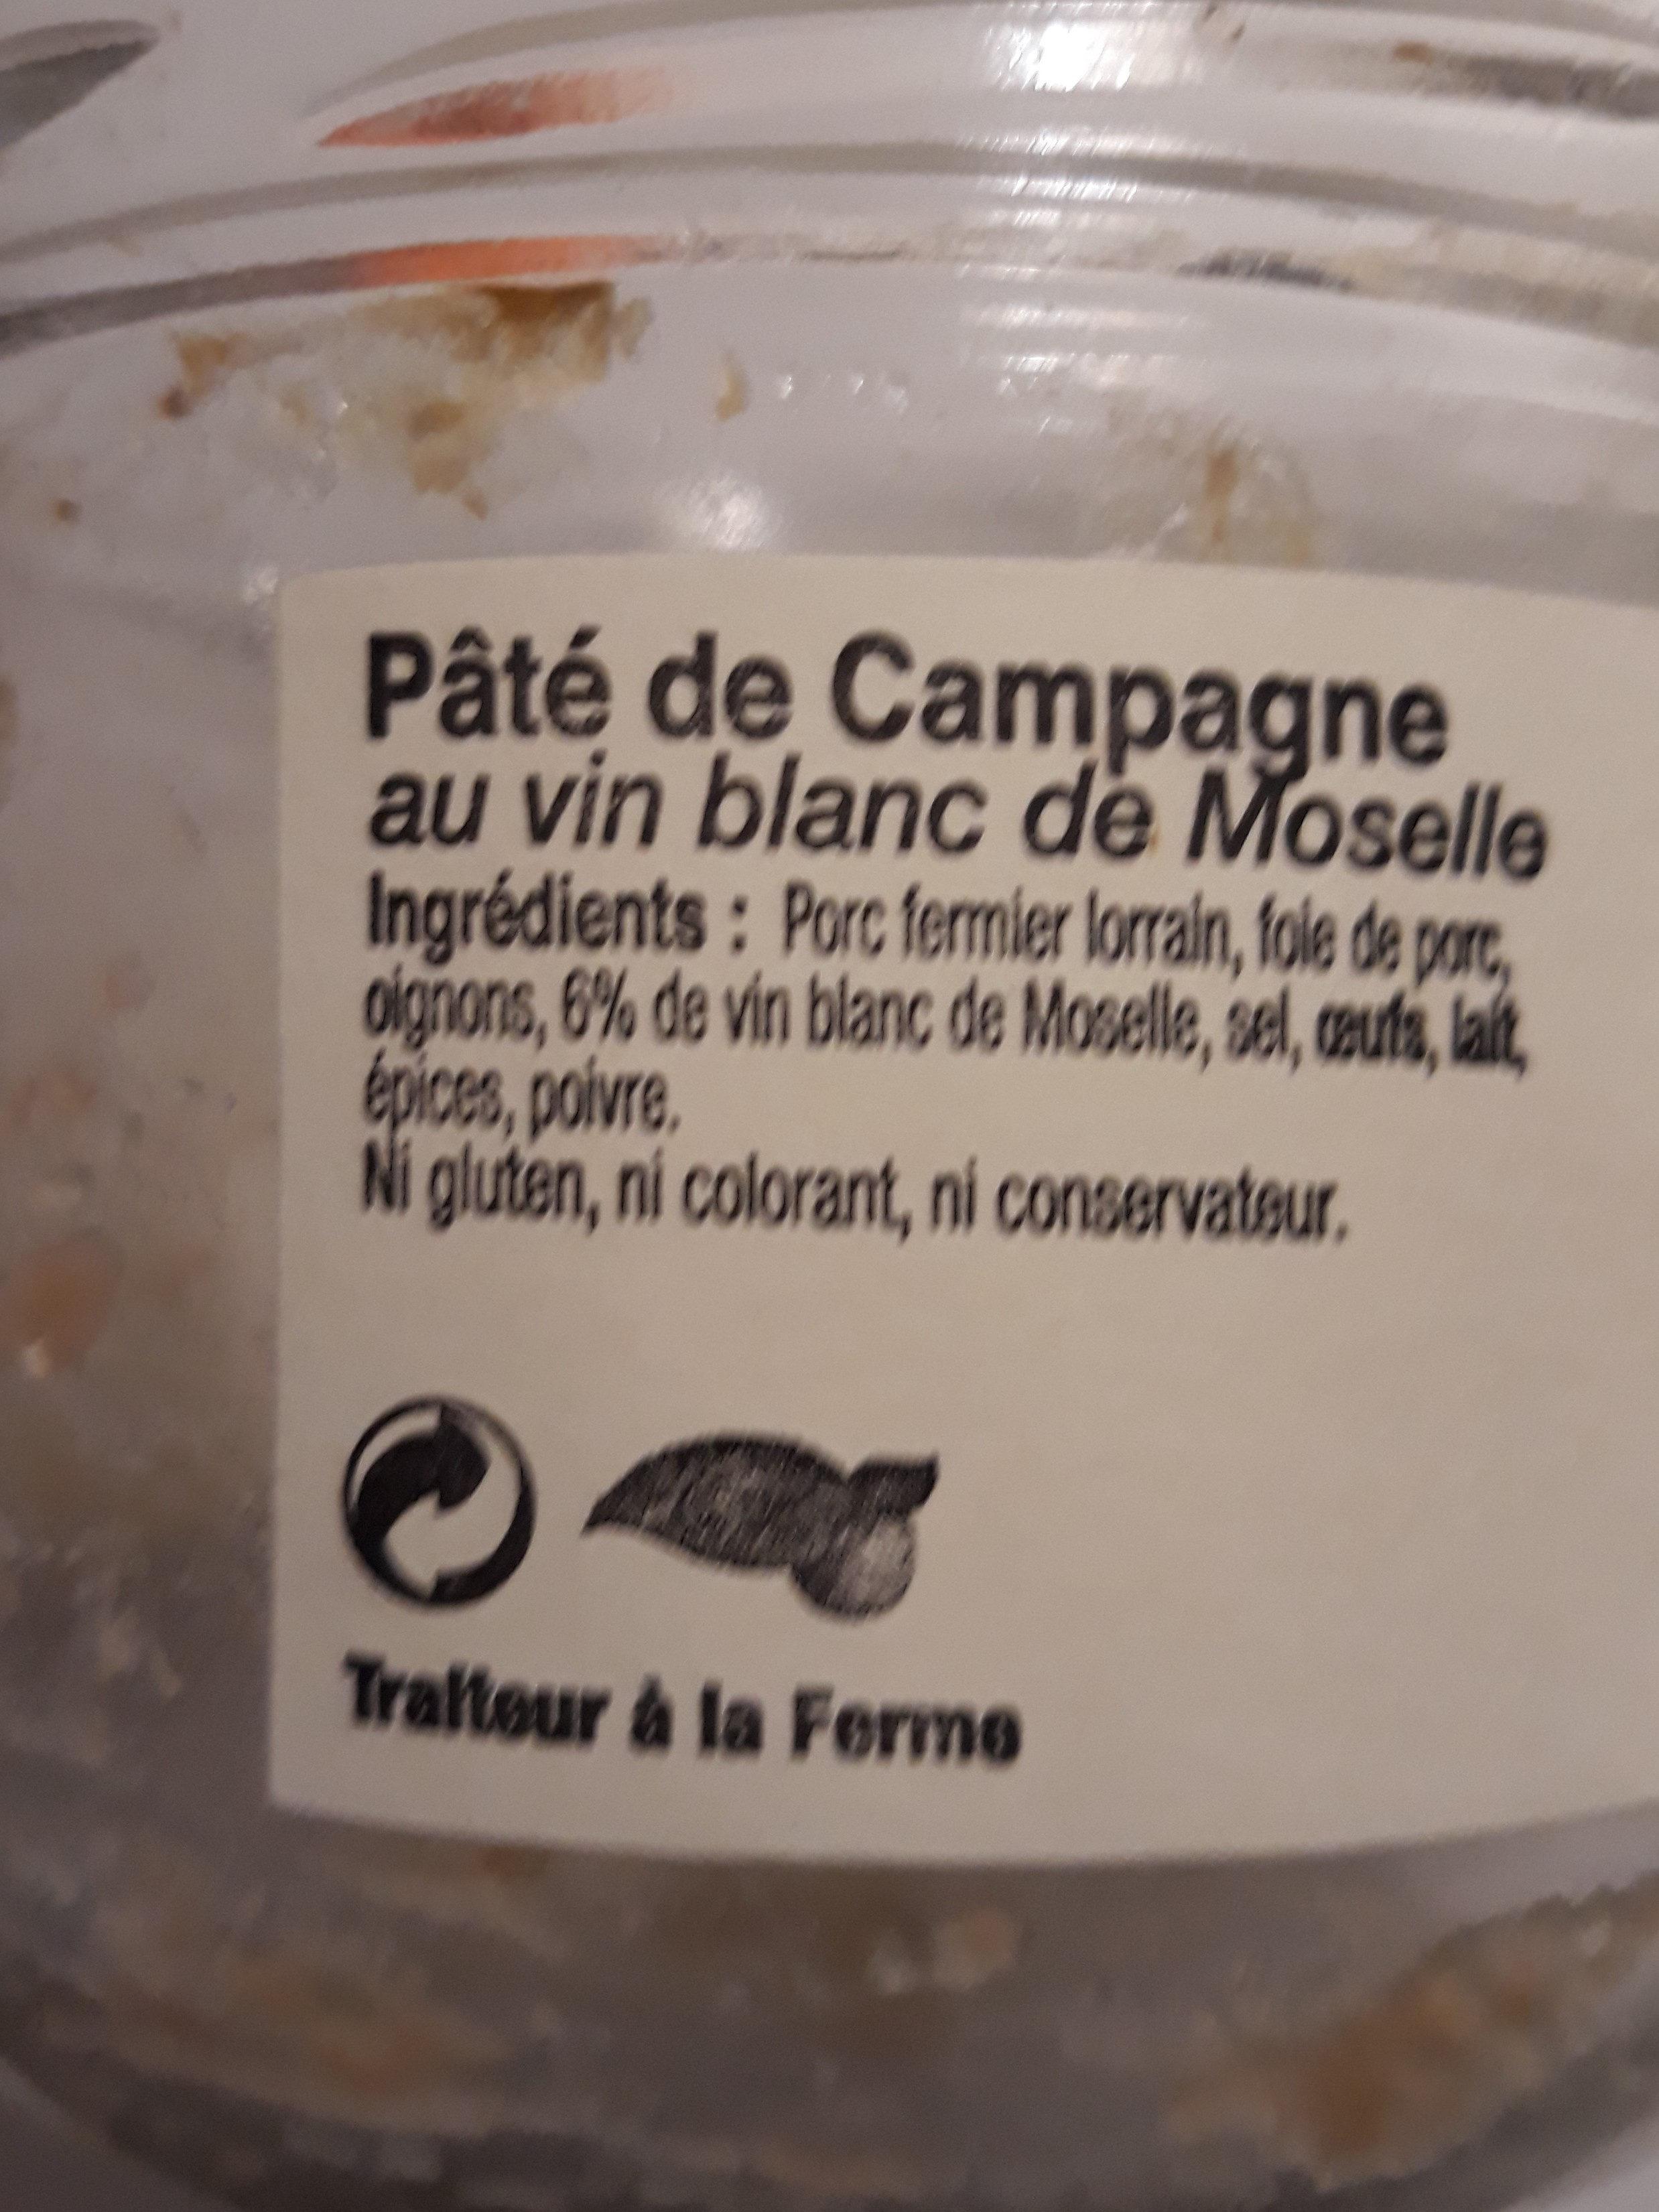 Pâté de campagne au vin blanc de Moselle - Ingrediënten - fr